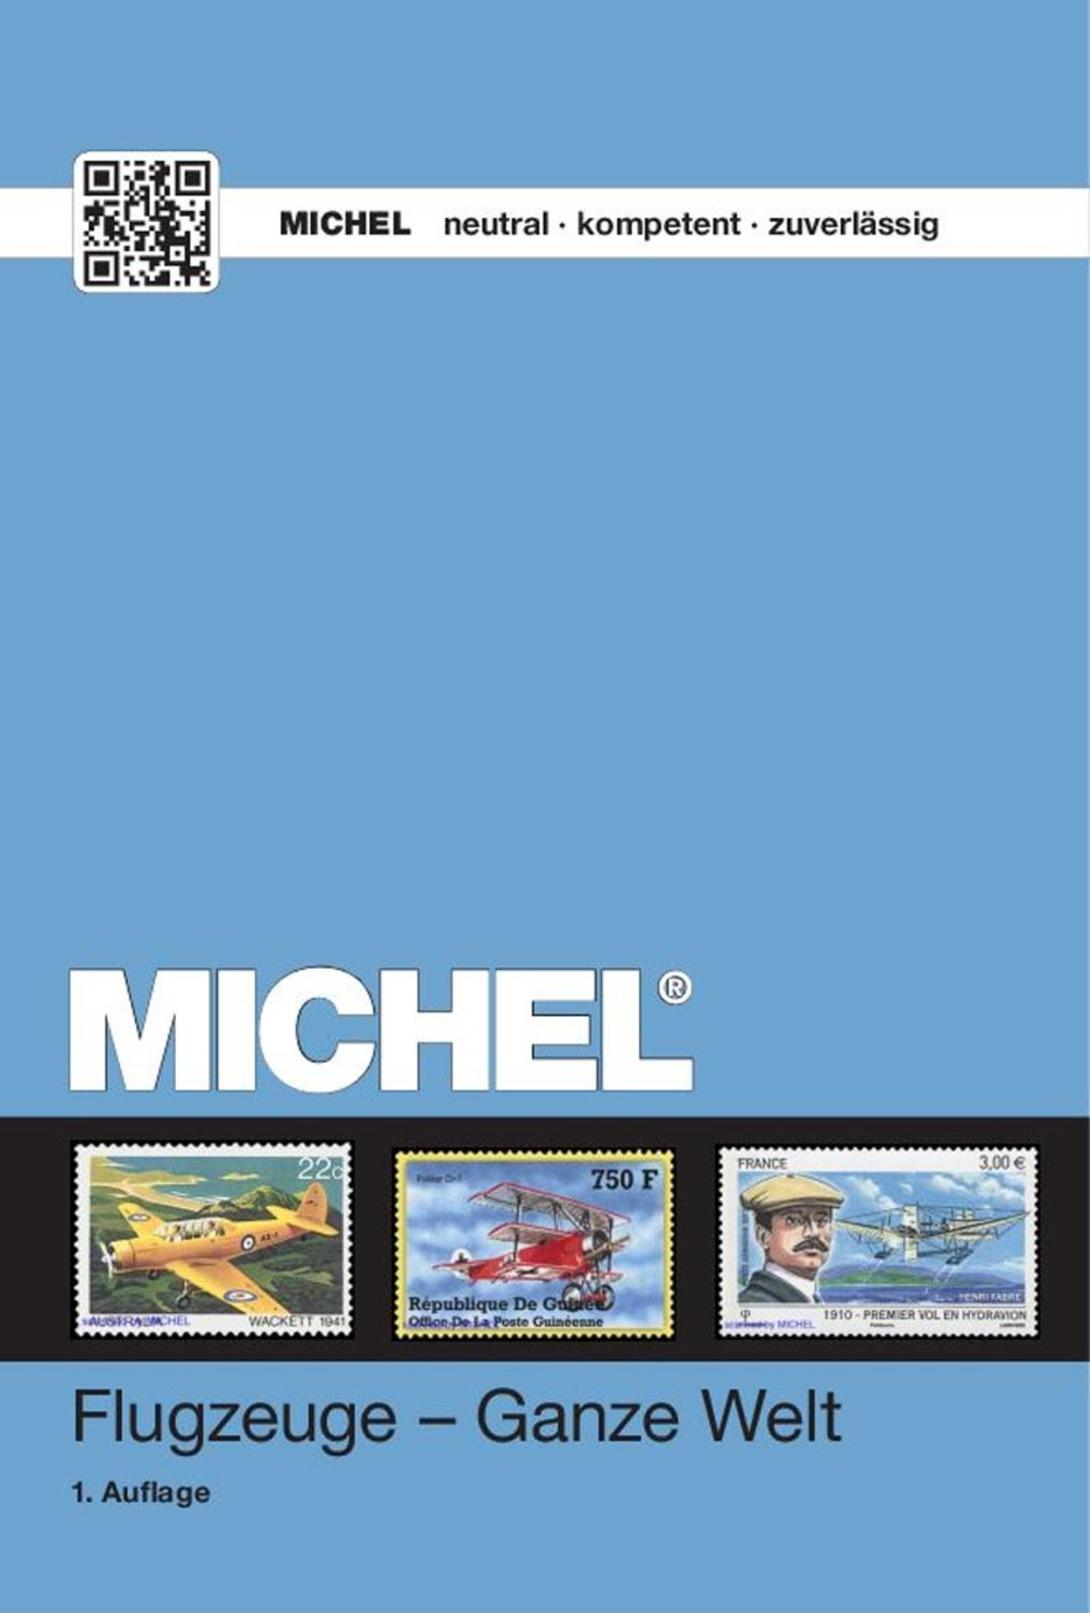 Michel Motivkatalog Flugzeuge - Ganze Welt 2016 - Temáticas